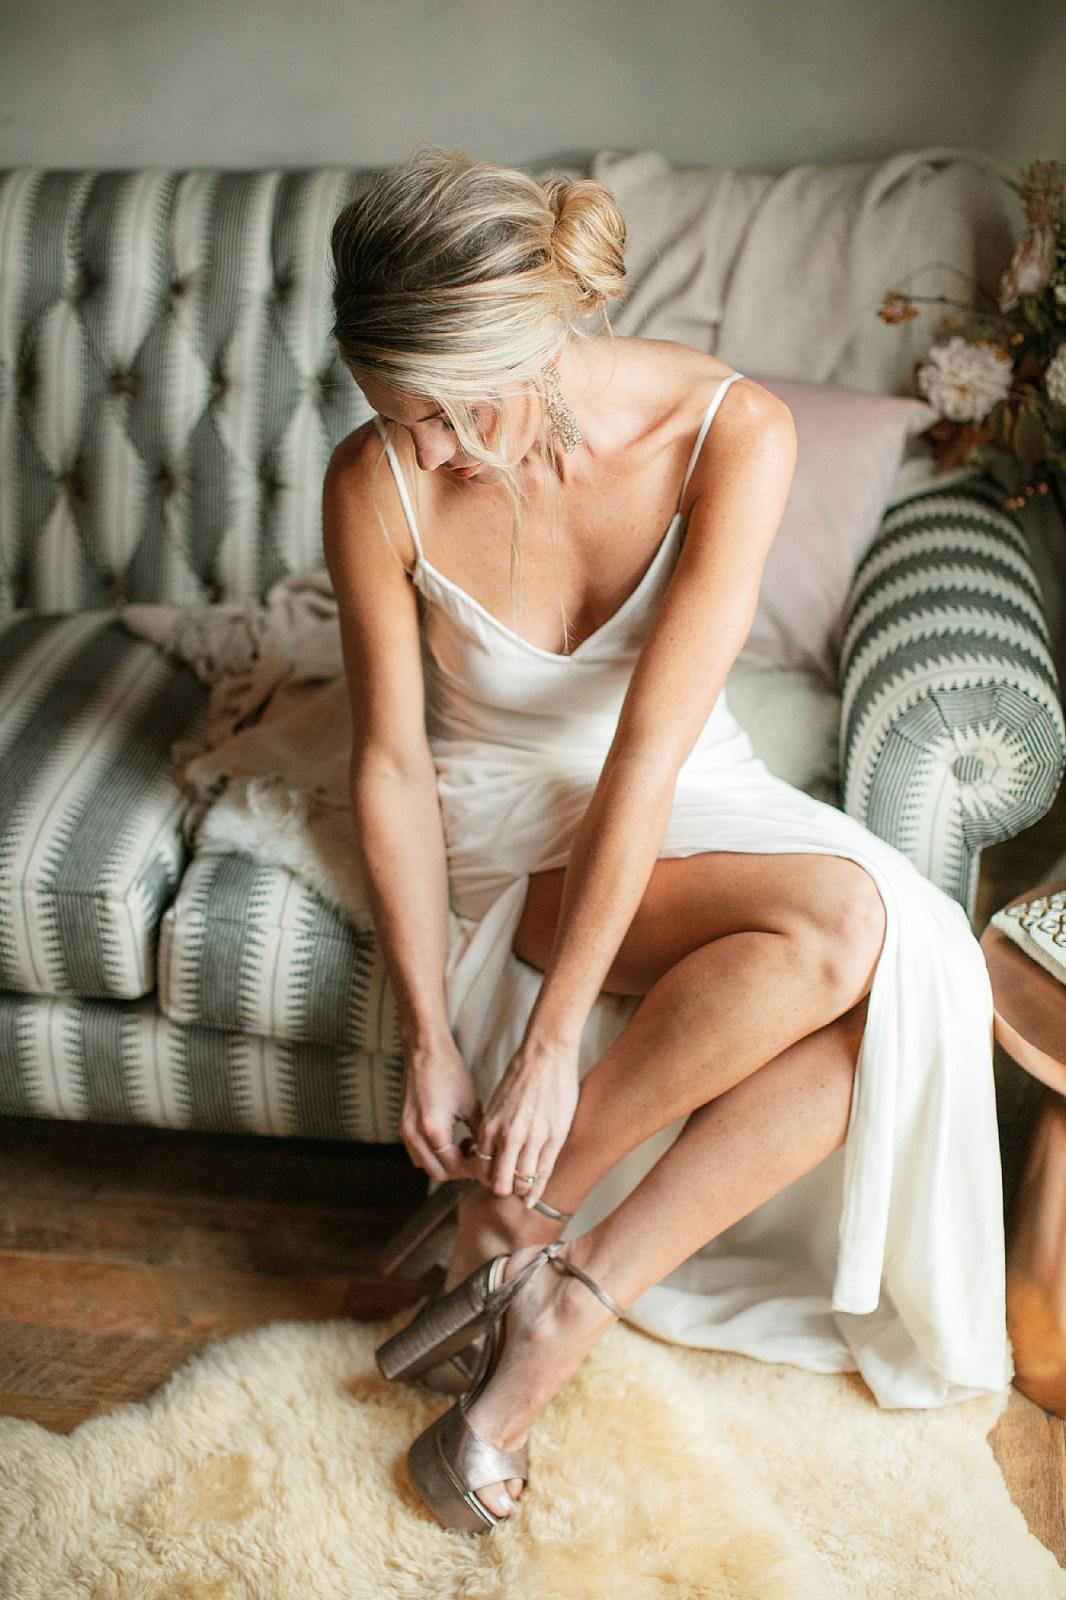 Terrain-at-Devon-Yards-Wedding-Photographer-Magdalena-Studios-Film-Photos-with-Shannon-Wellington-Weddings0011-2.jpg